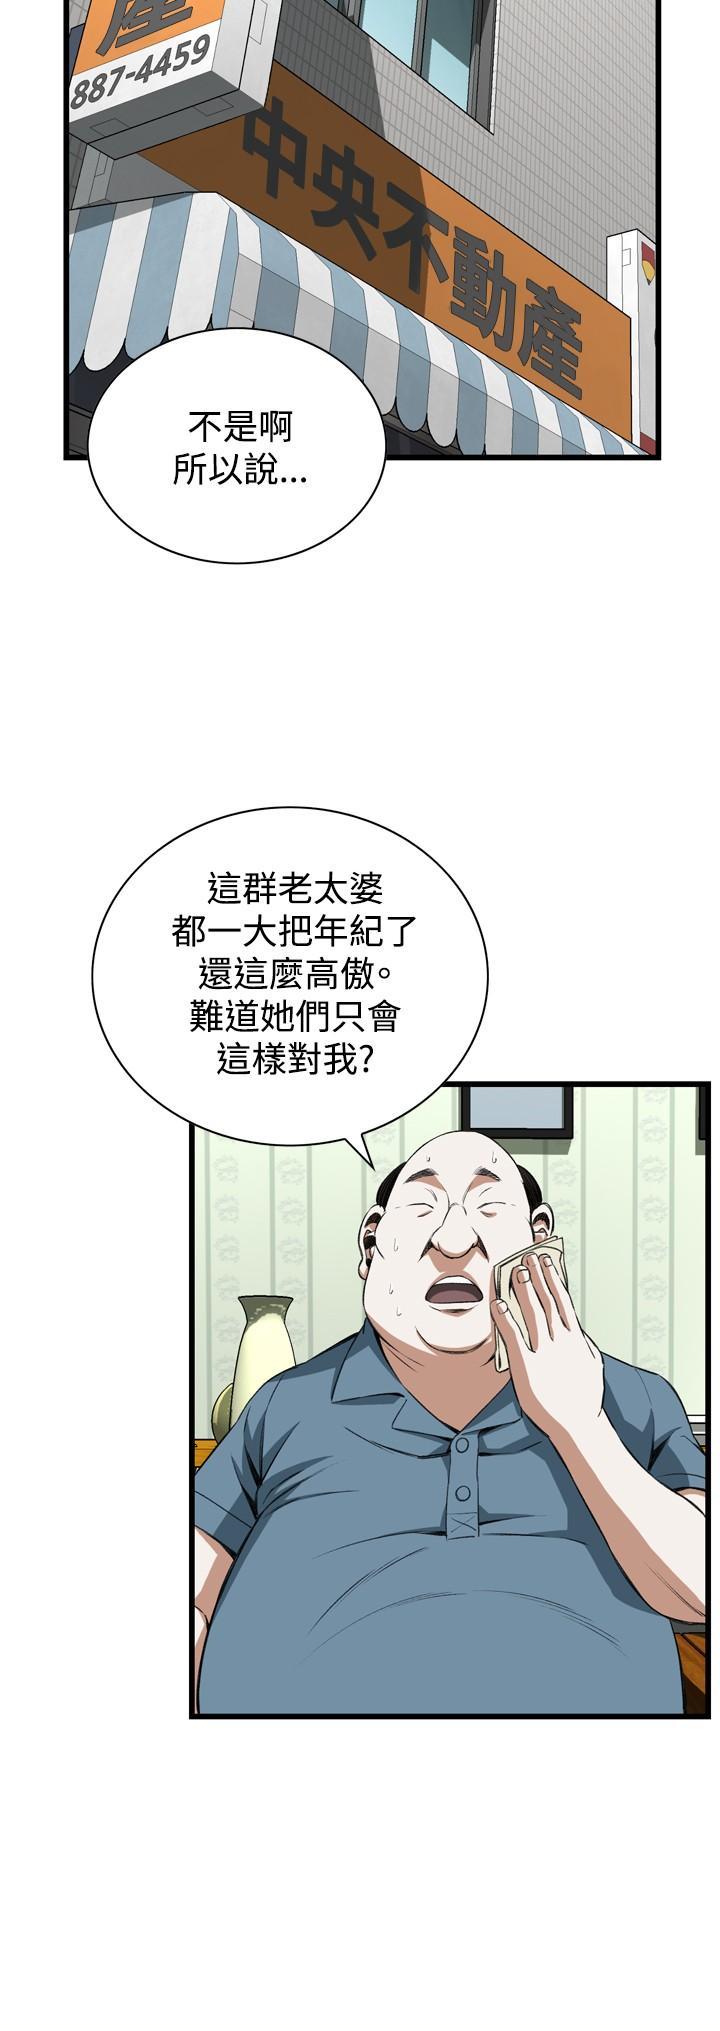 Take a Peek 偷窥 Ch.39~60 [Chinese]中文 612